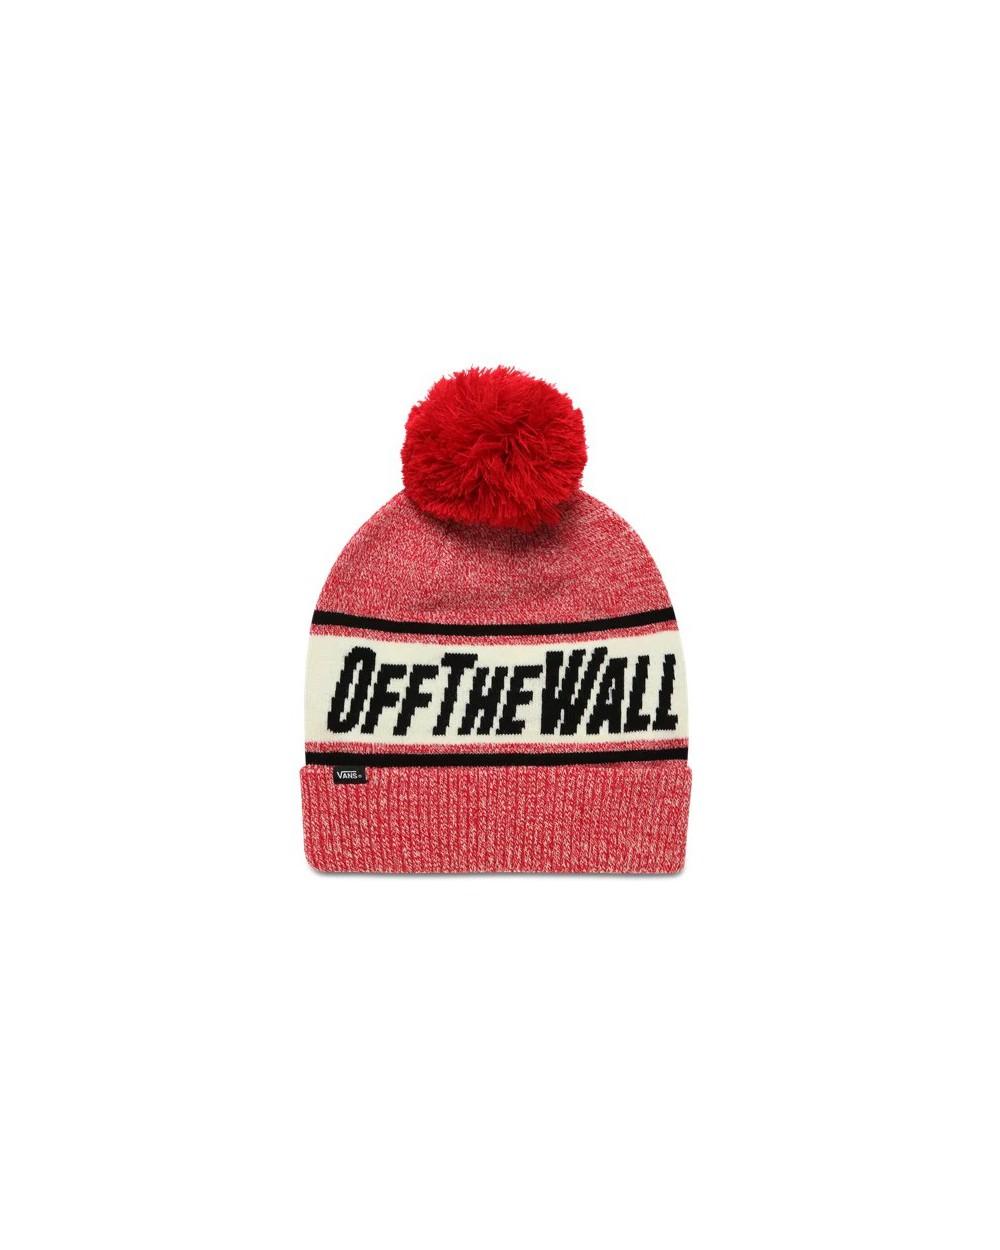 Vans Off The Wall Pom Beanie - Chili Pepper Black